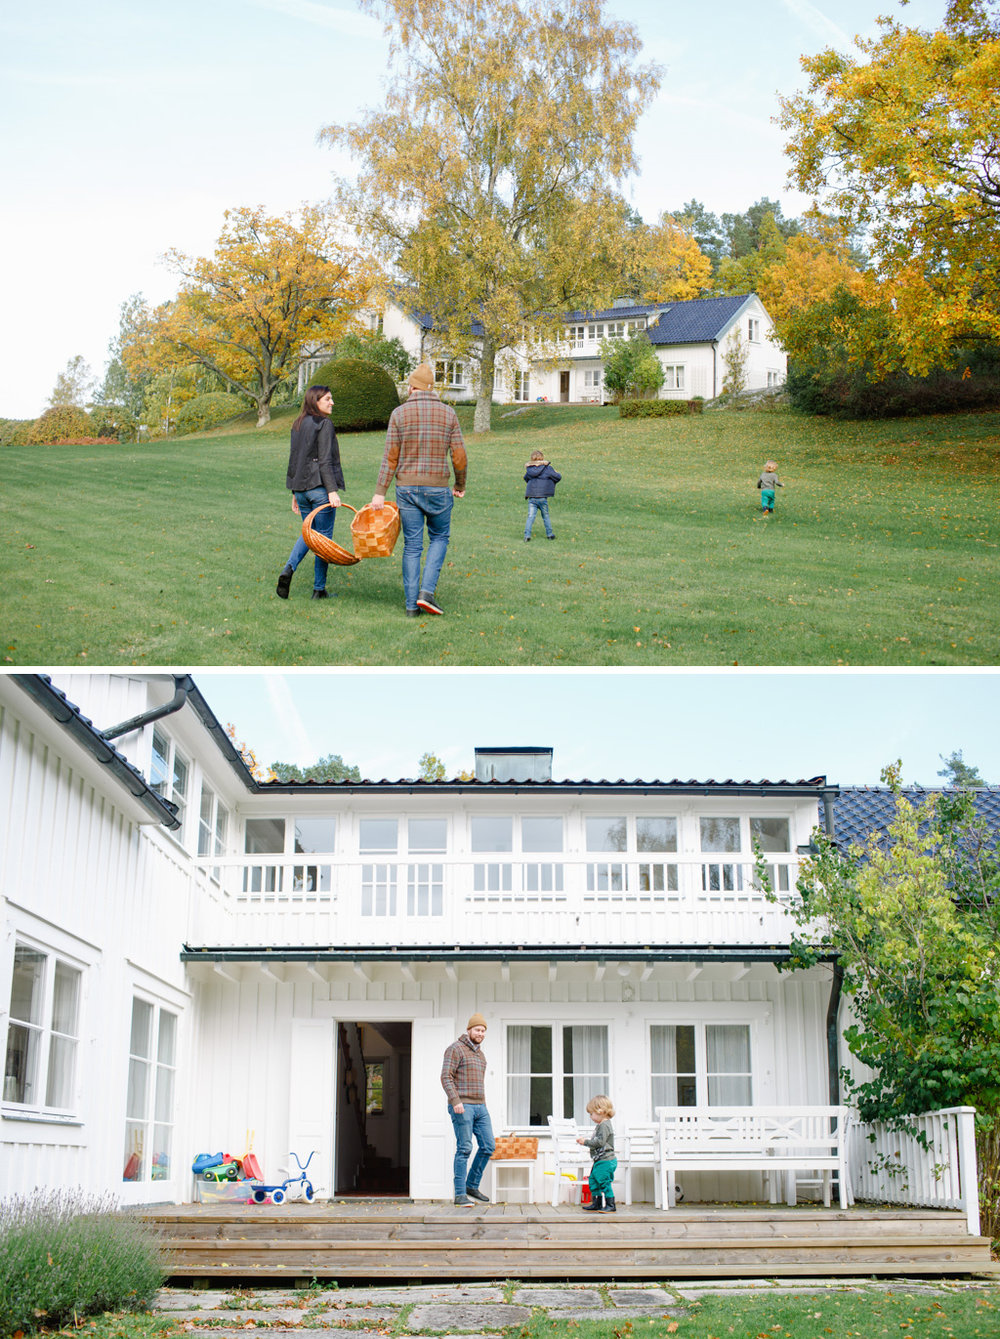 Hostfotografering_Lifestyle_hemma-hos-fotografering_Familjefotograf_Stockholm_4.jpg